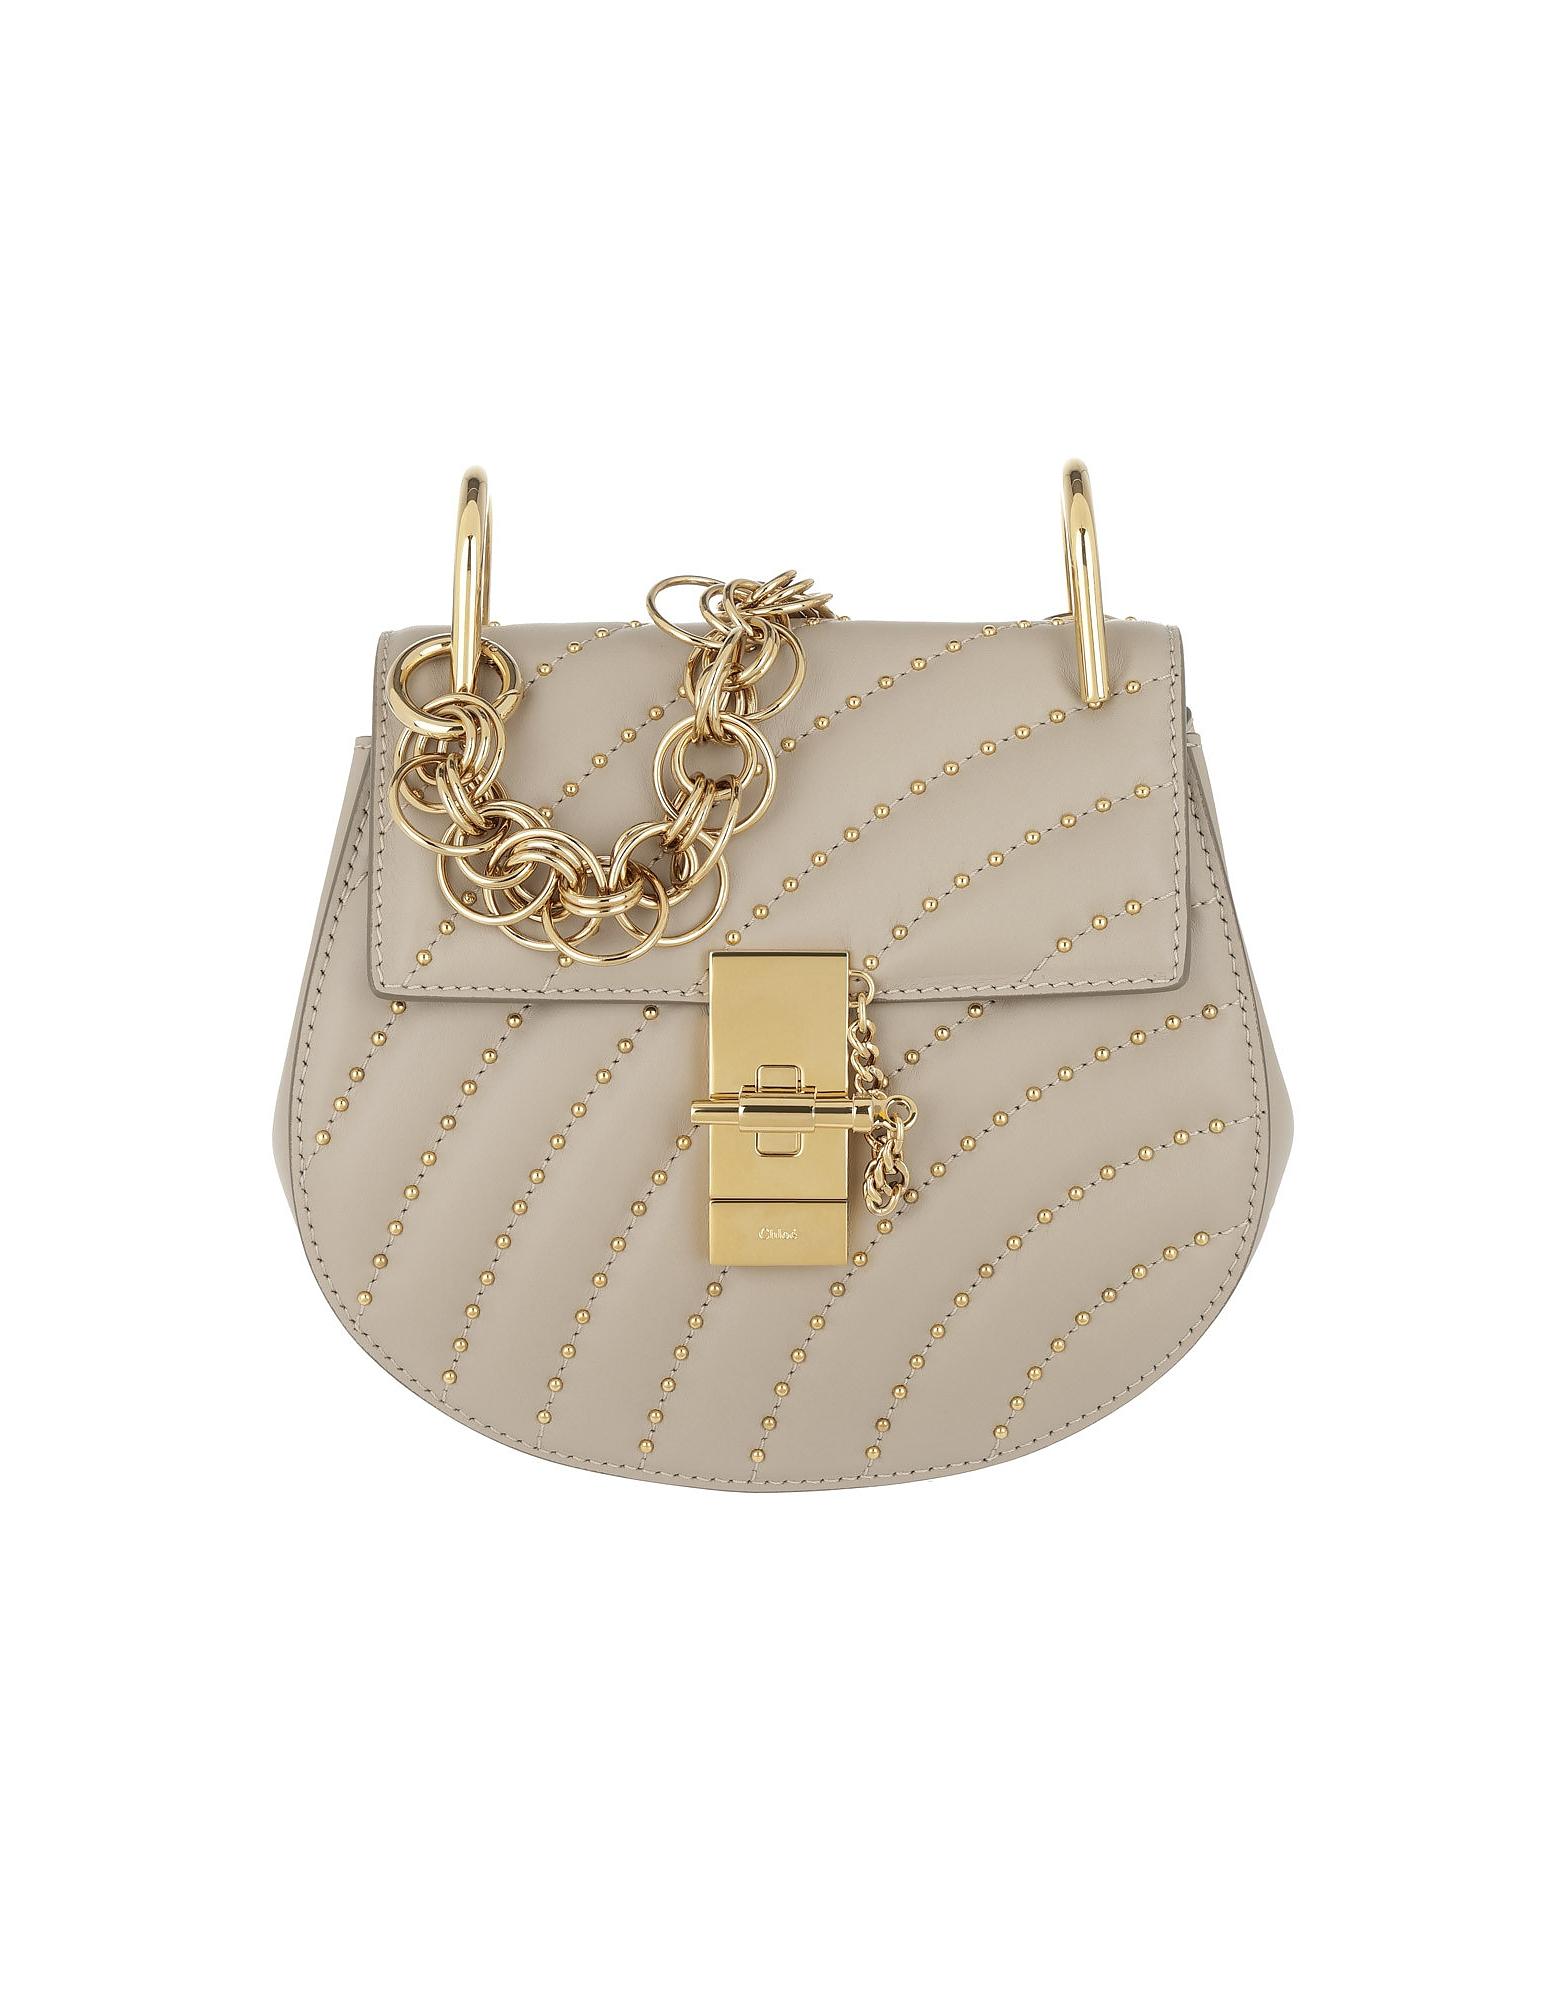 Chloe Handbags, Drew Bijou Mini Leather Pastel Grey